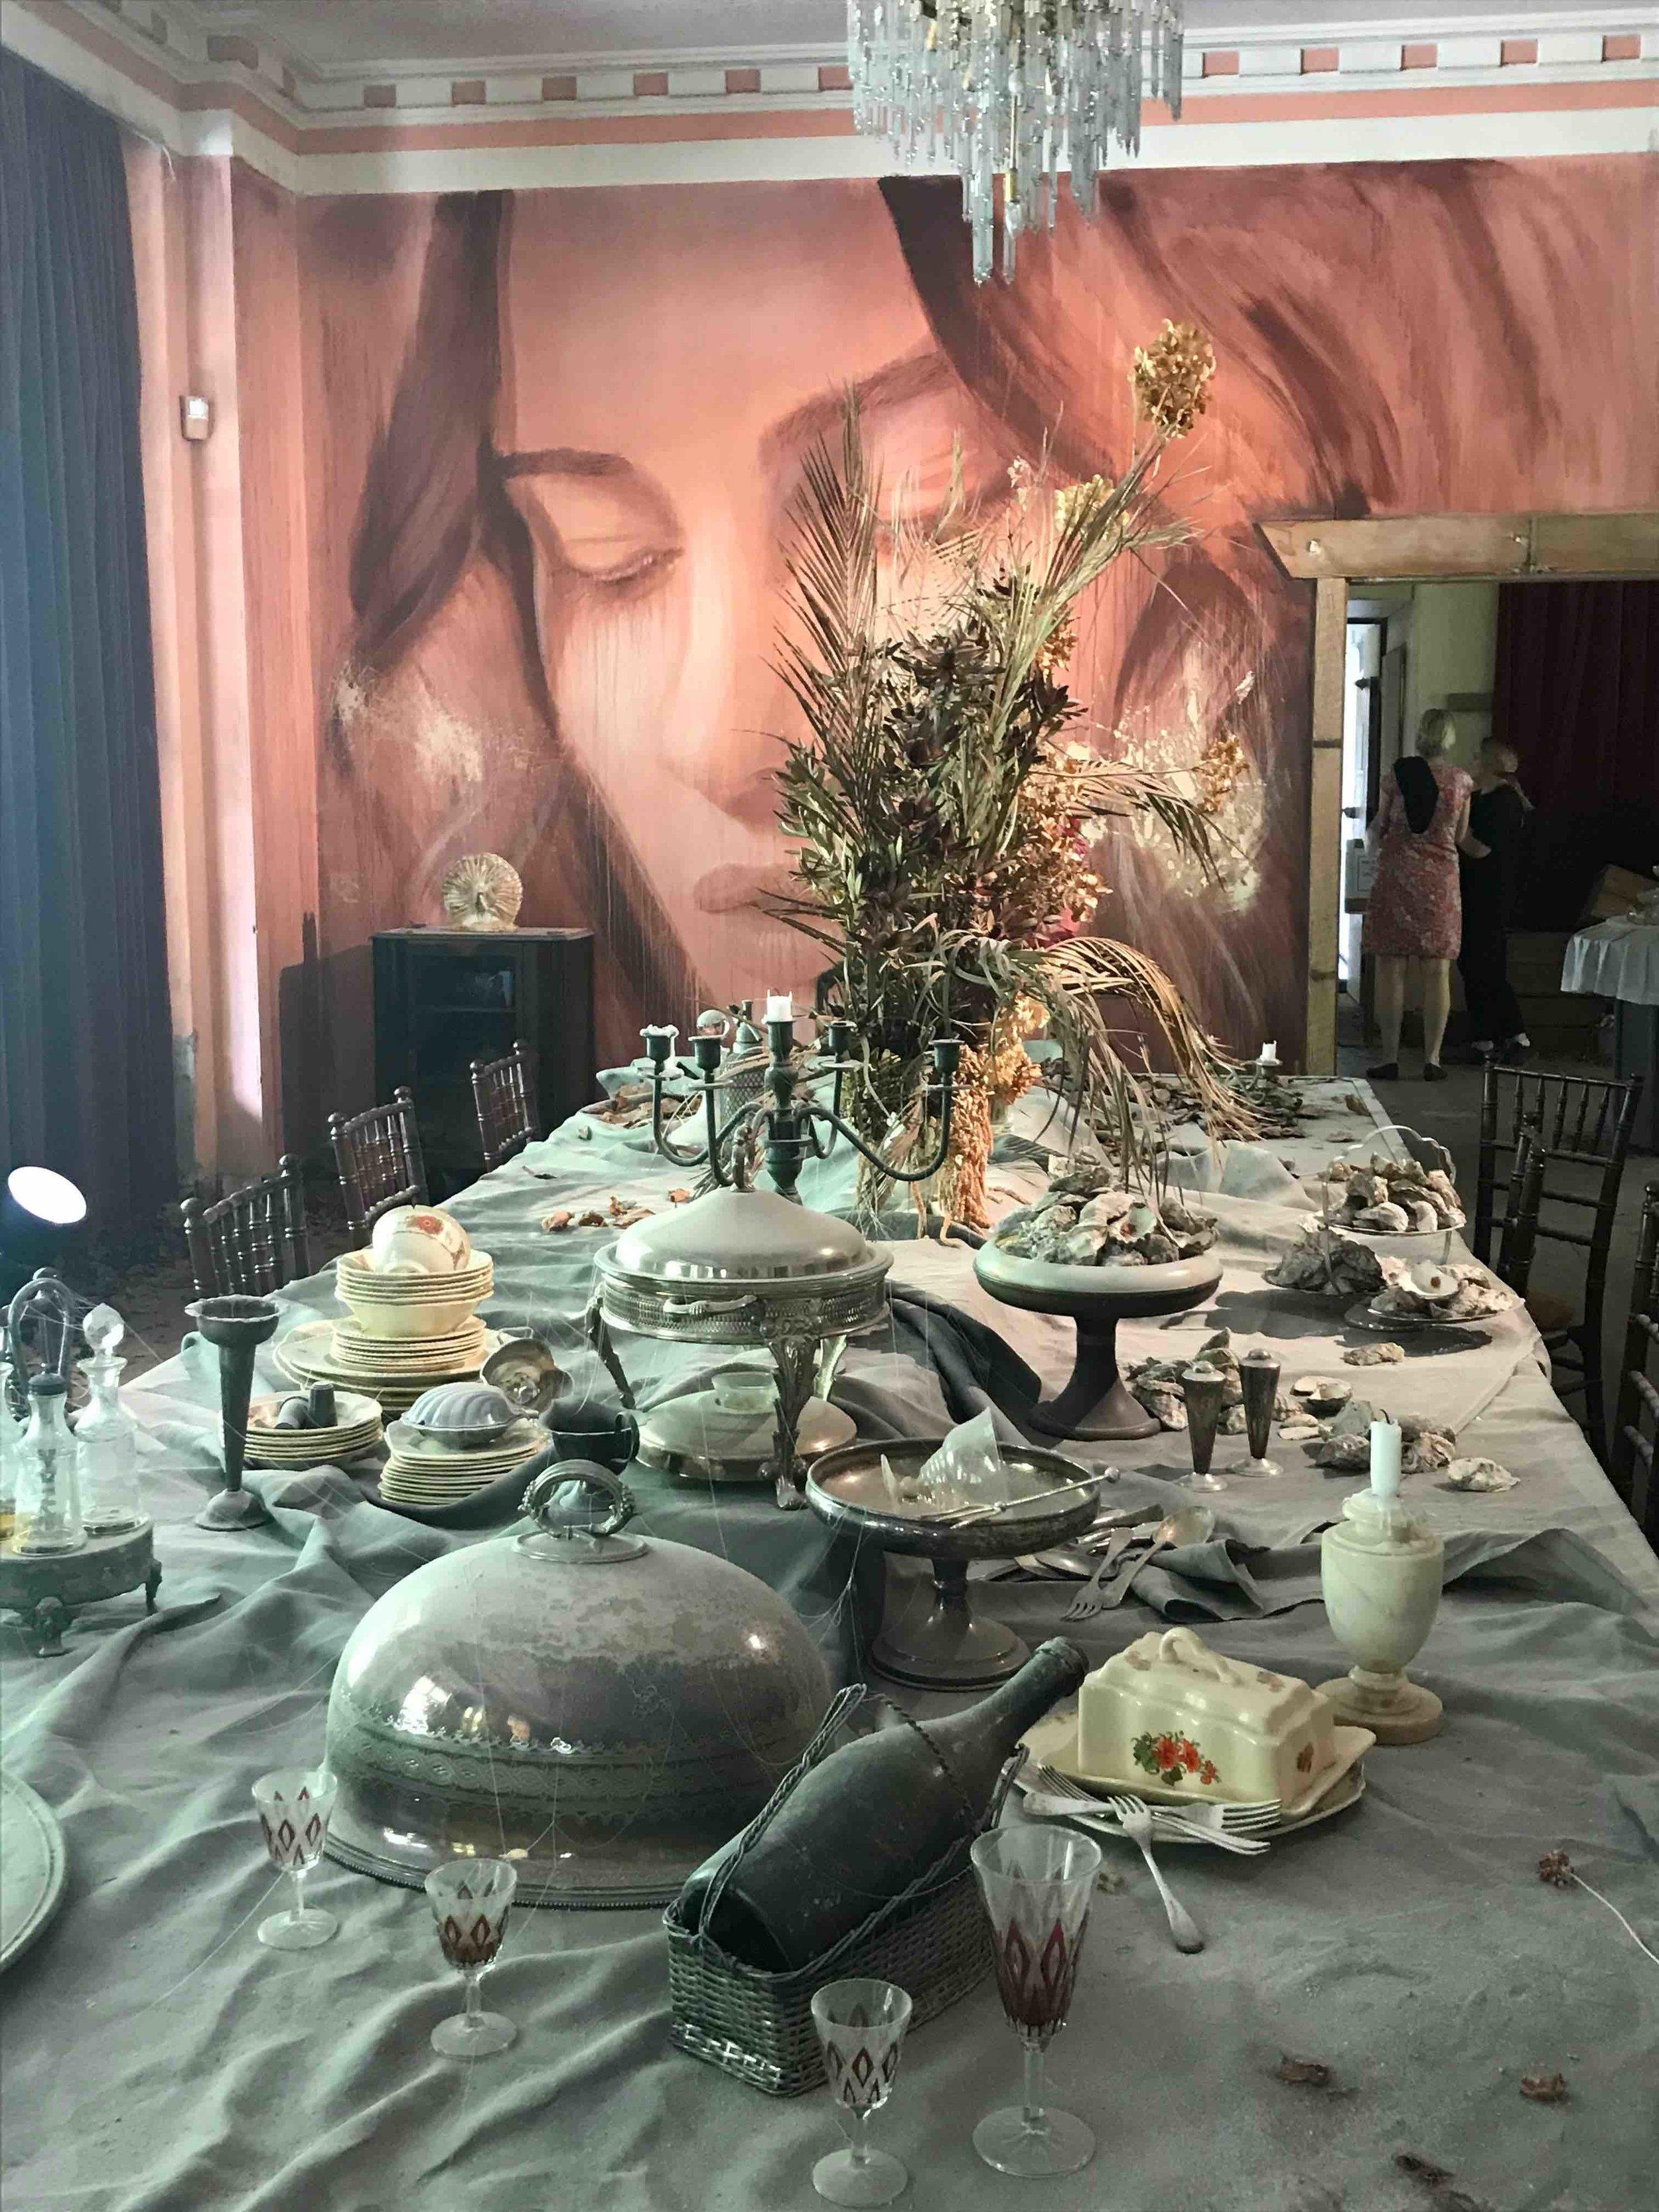 The Dining Room (Photo: Laura Jocic)